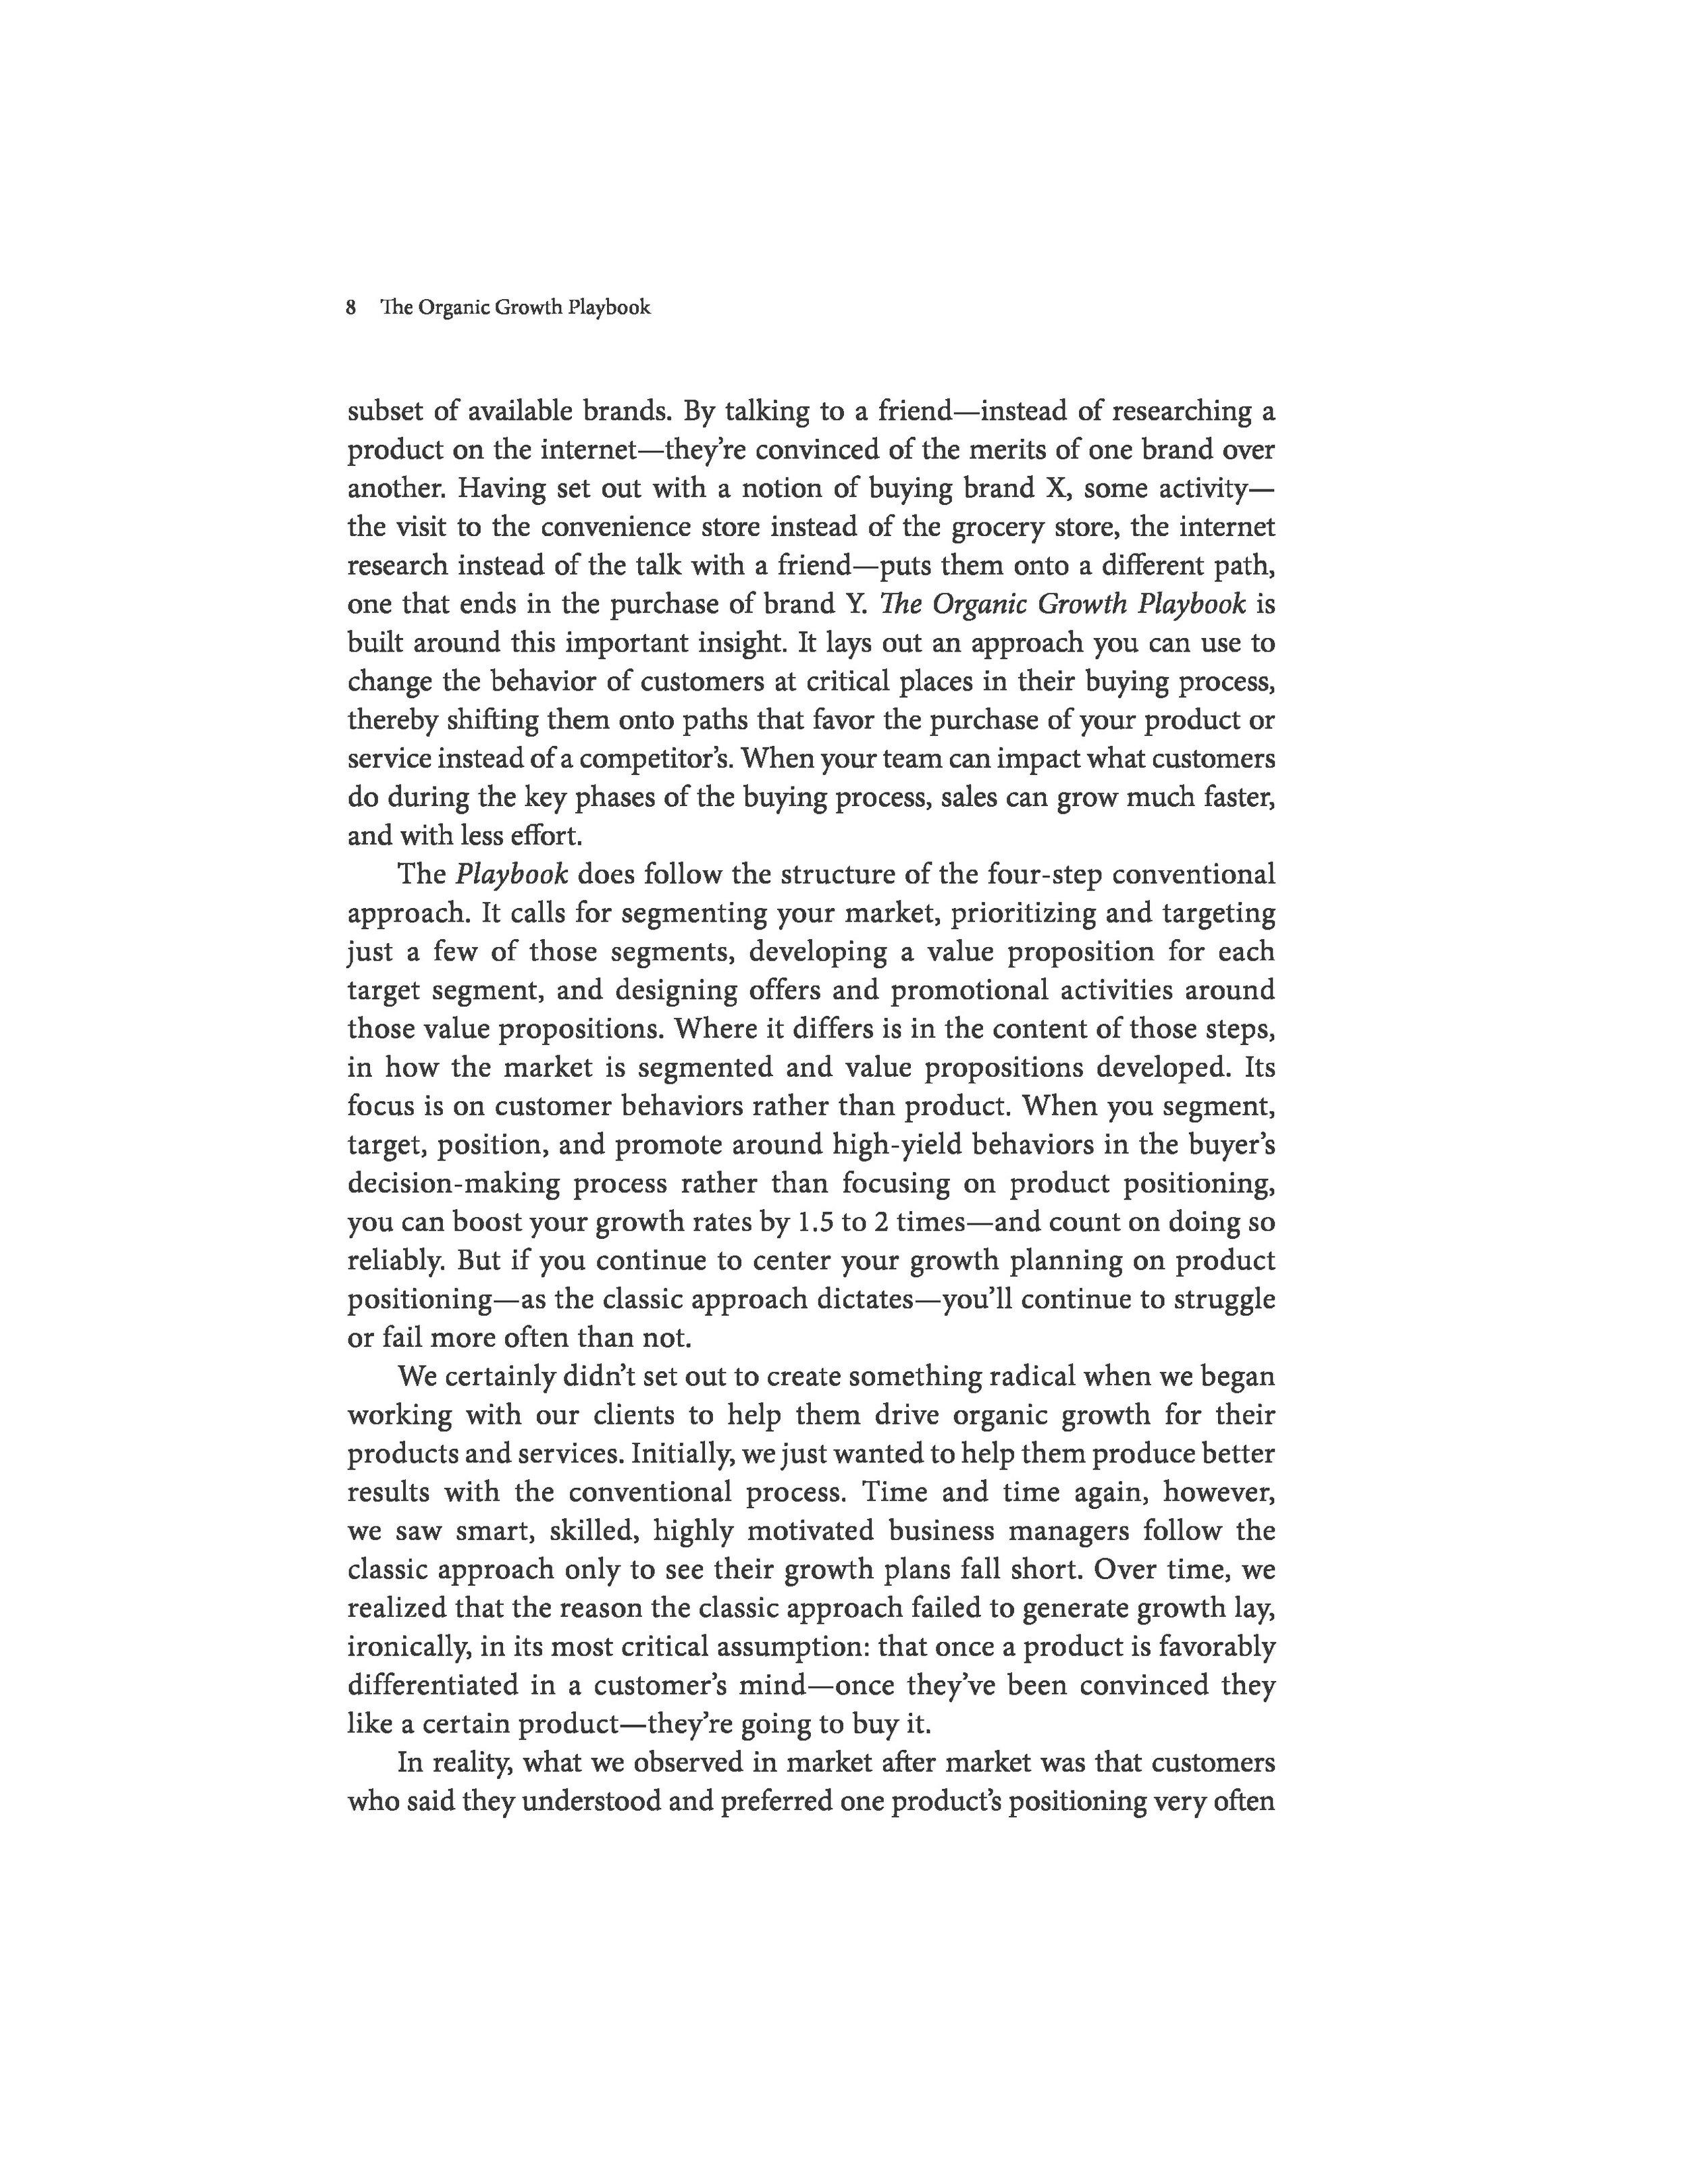 OGP excerpt-page-7.jpg